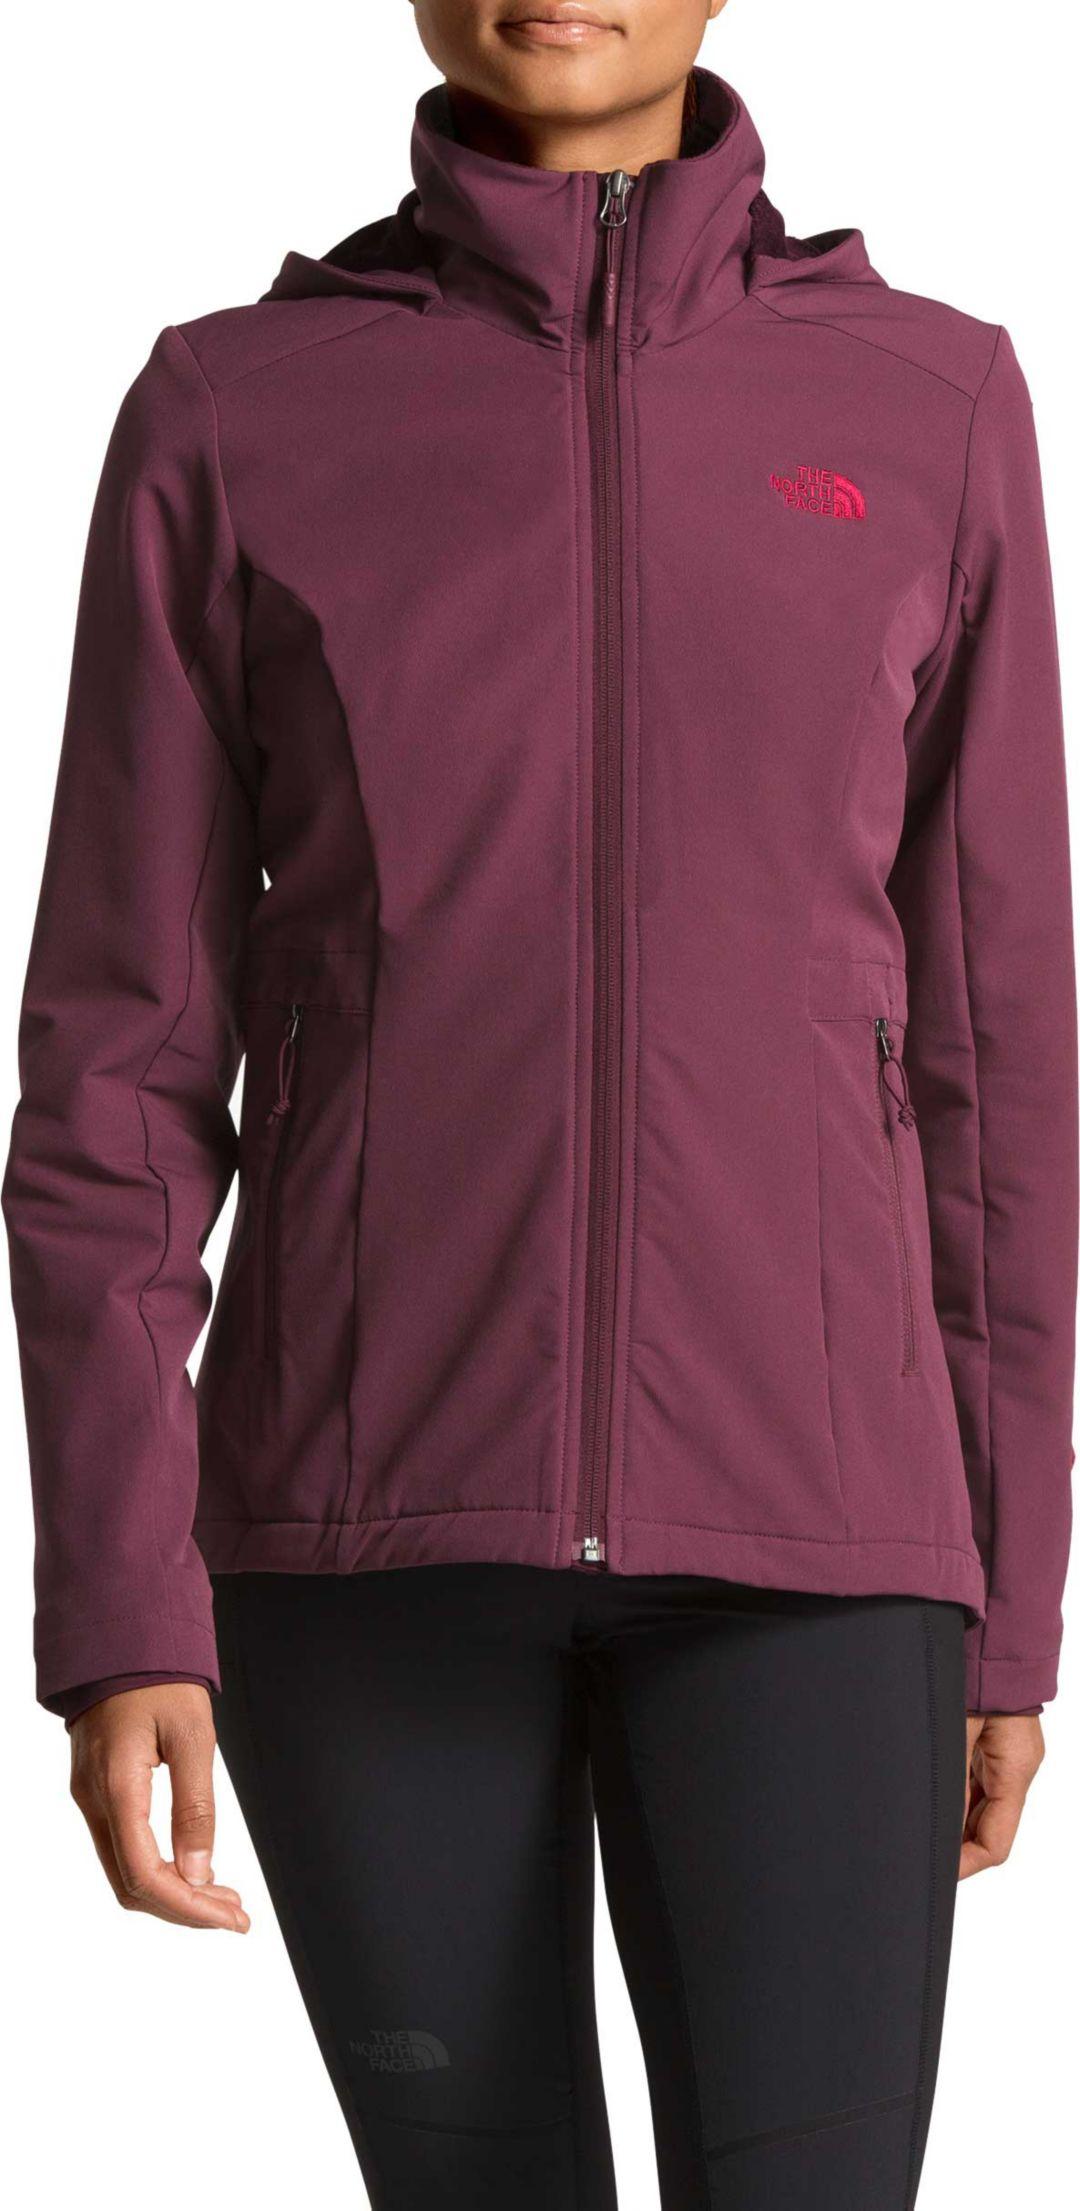 95d25b07706d The North Face Women's Shelbe Raschel Soft Shell Jacket